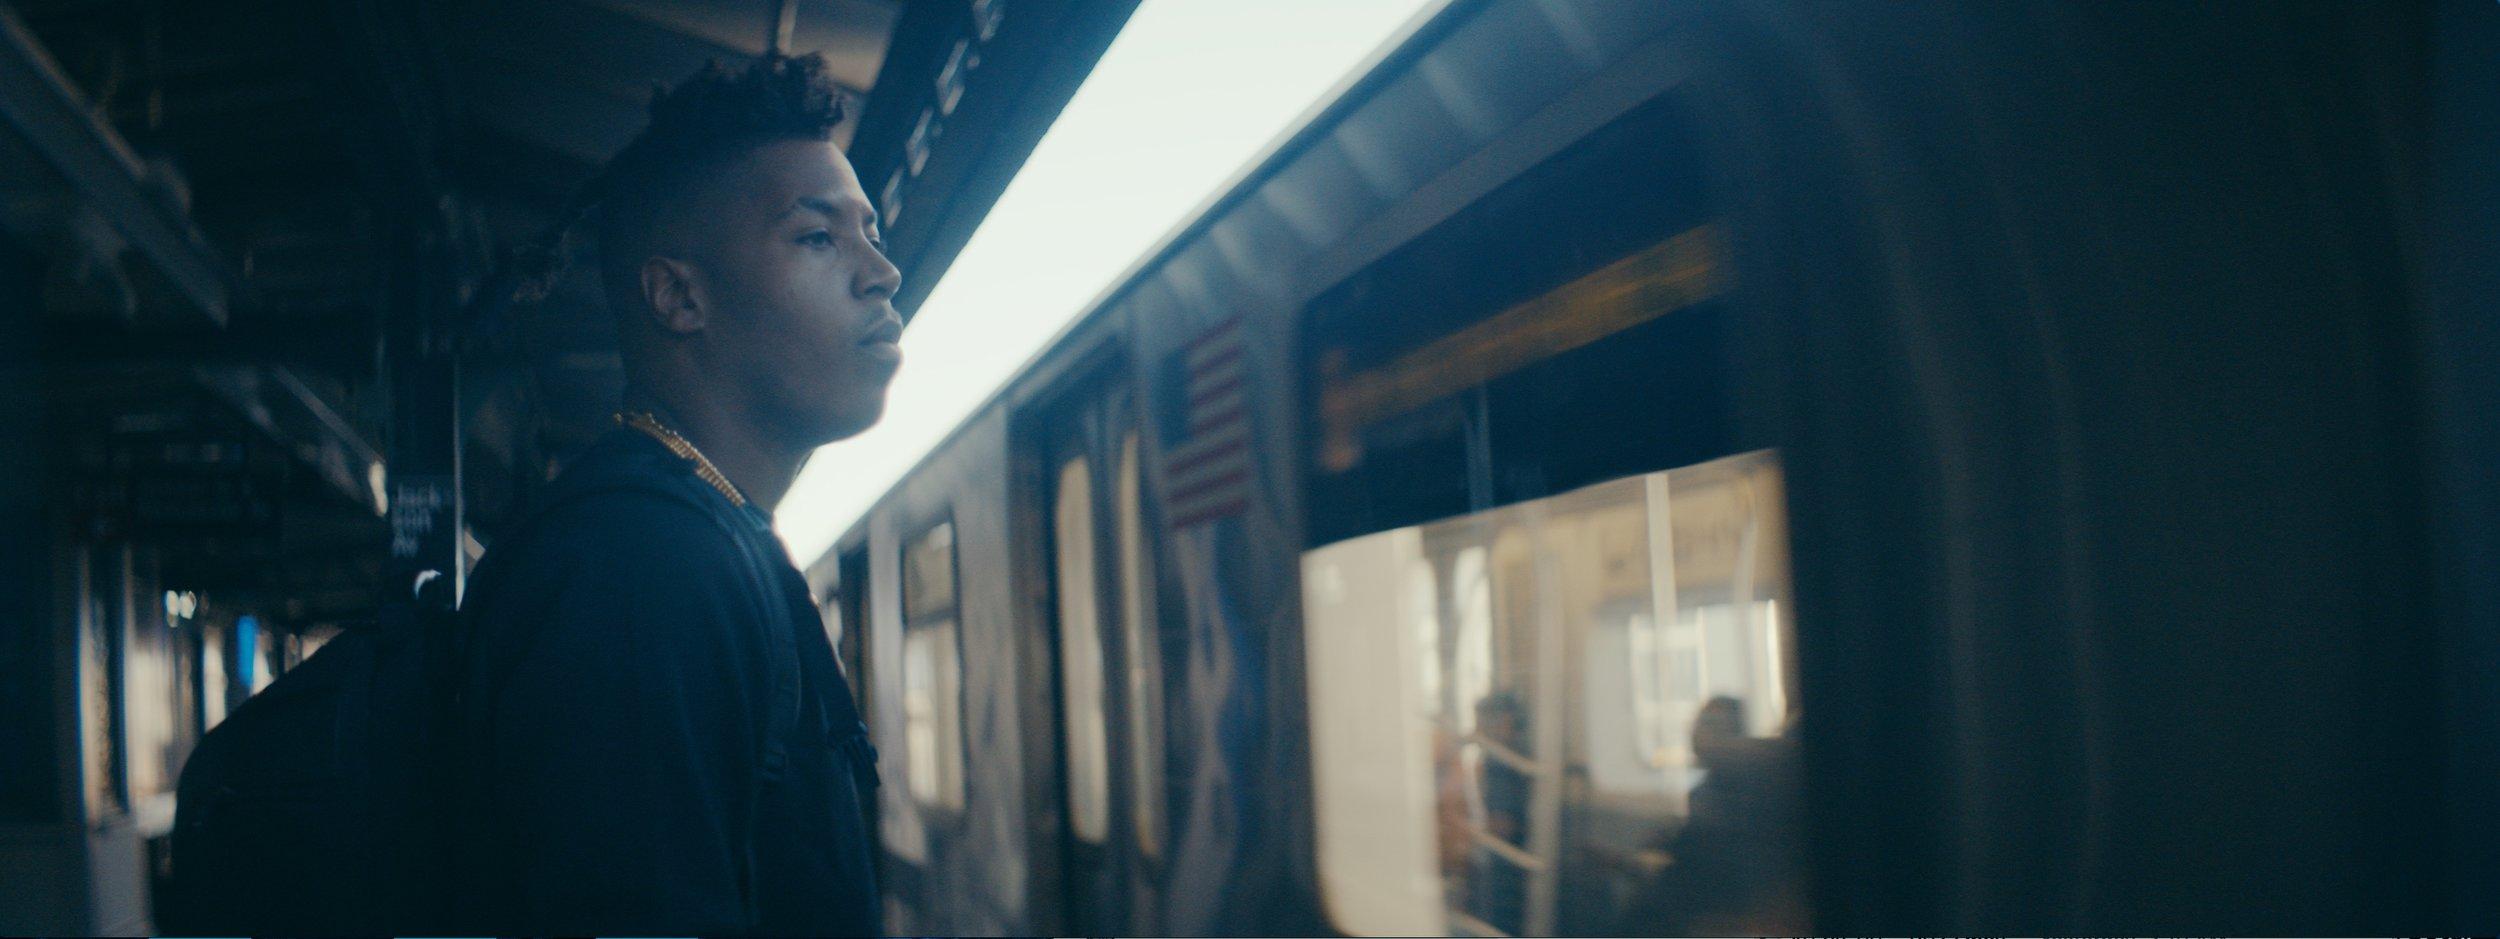 Christian Scott_Subway.jpg